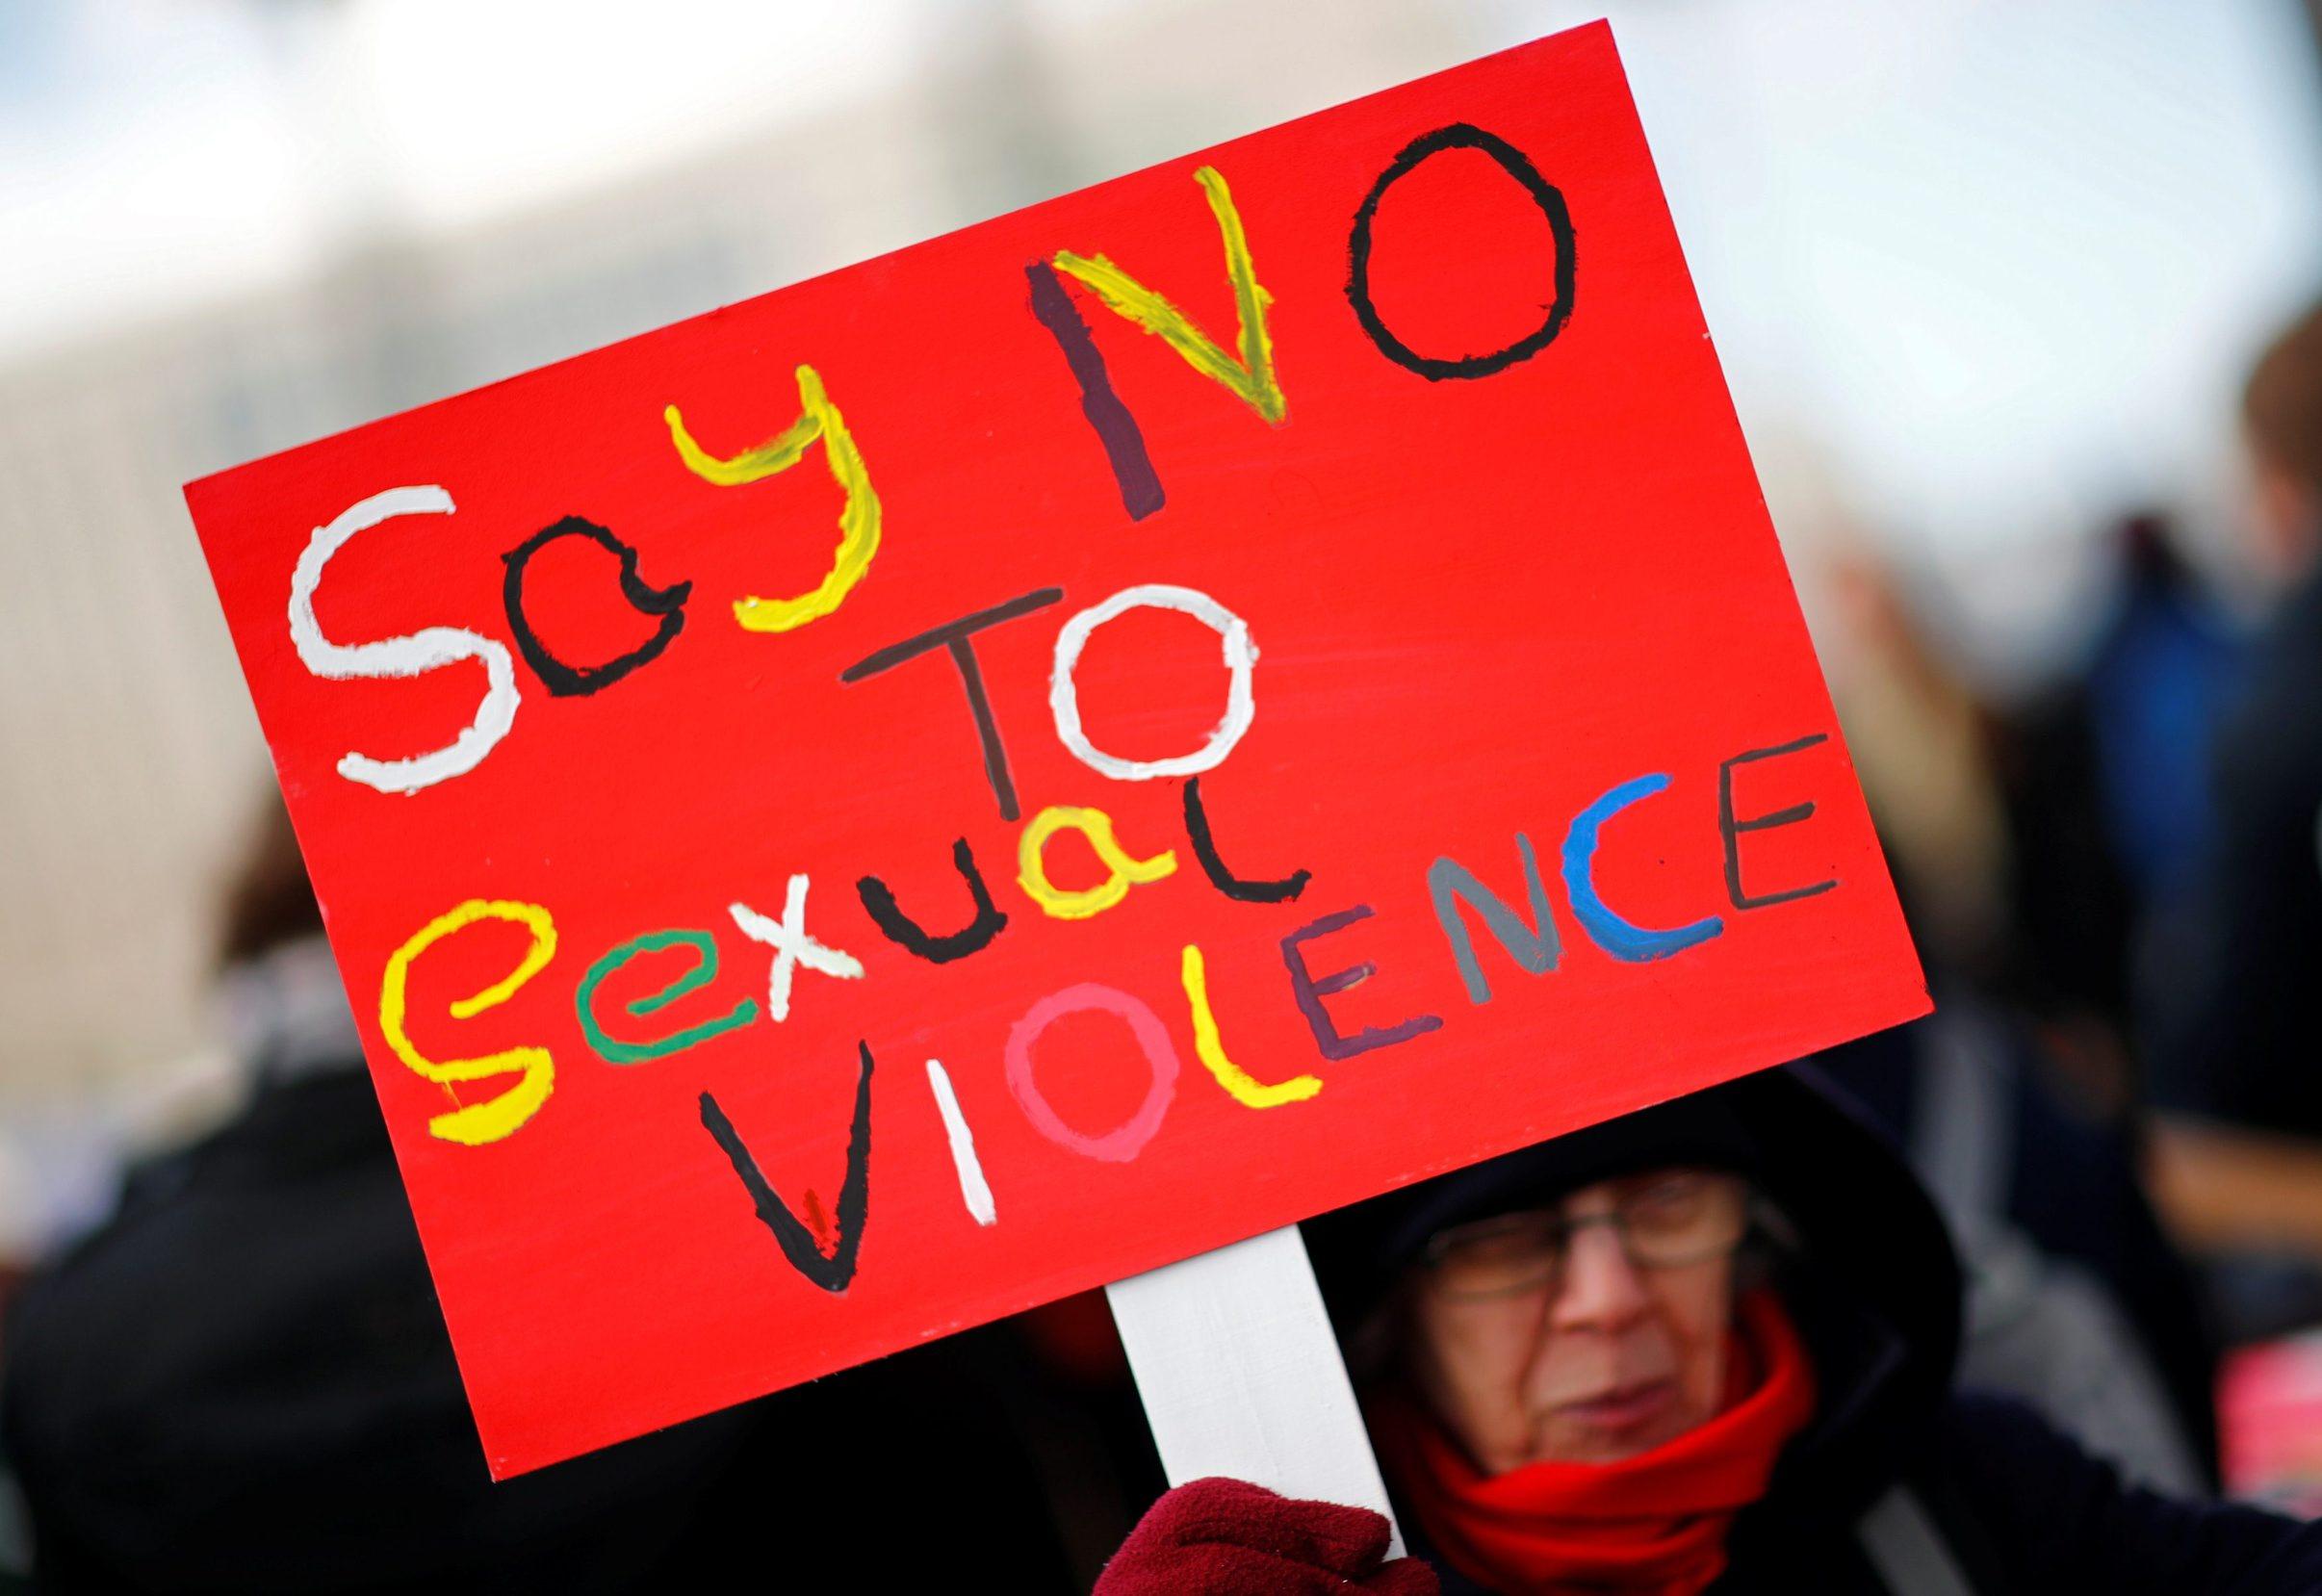 People take part in a march marking International Women's Day in Berlin, Germany, March 8, 2019. REUTERS/Hannibal Hanschke